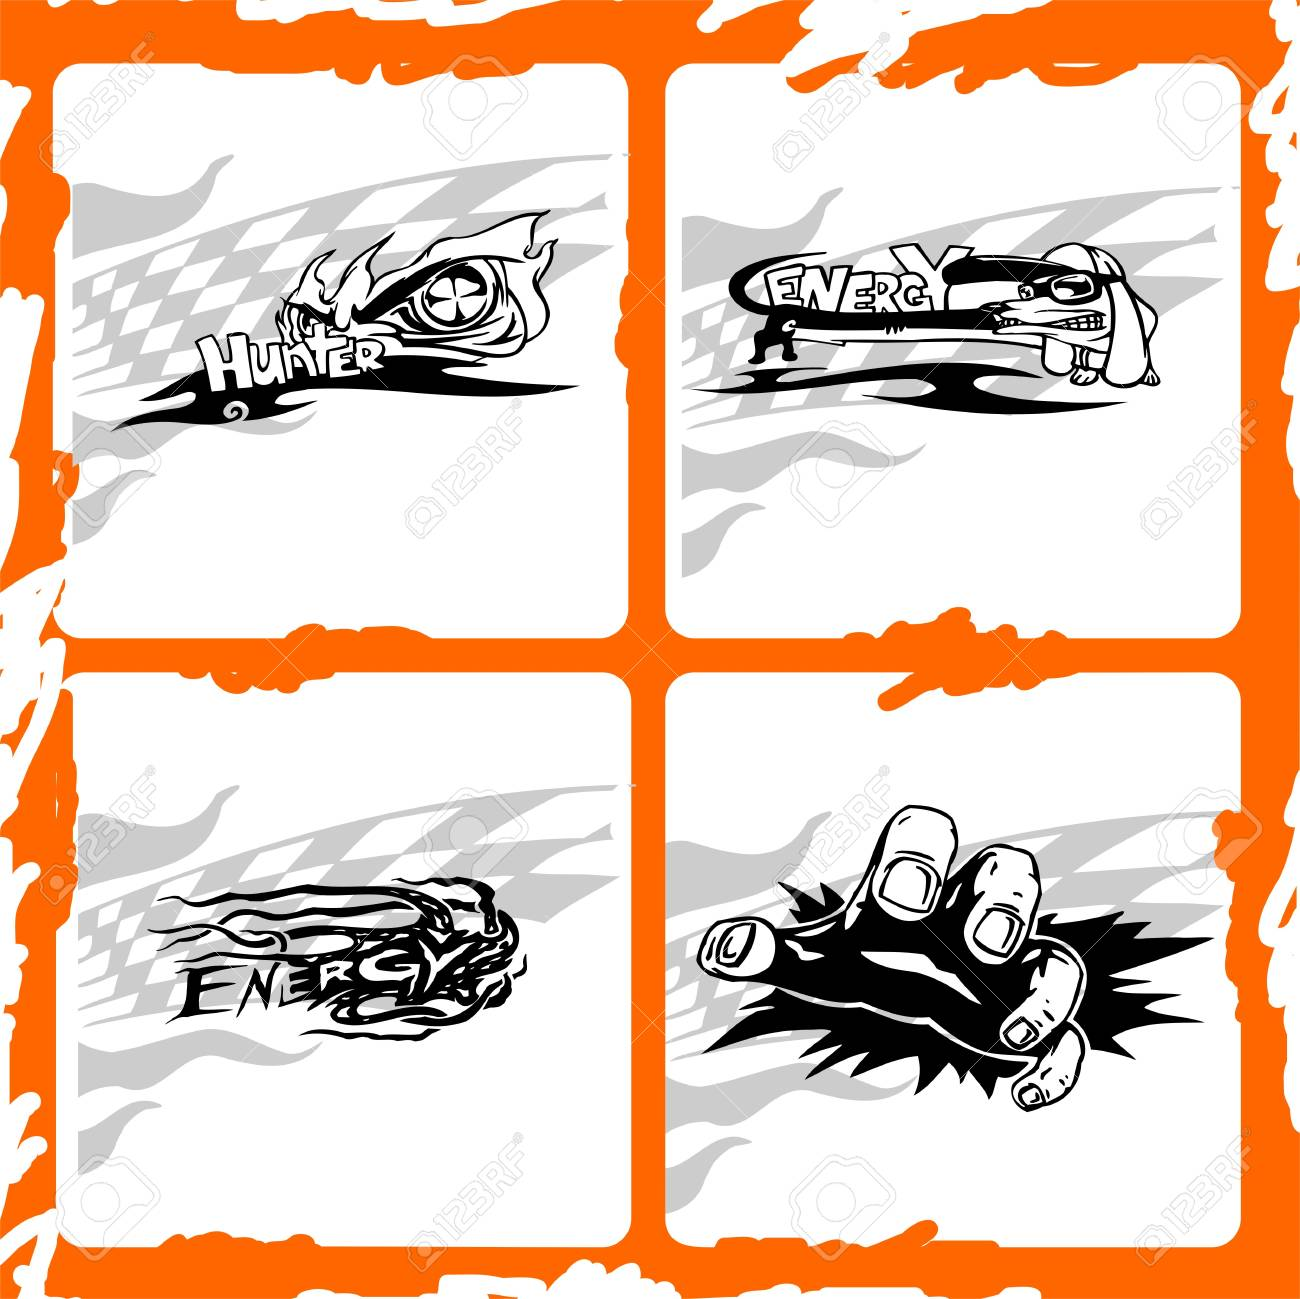 Trucks Graphics.Vector illustration ready for vinyl cutting. Stock Vector - 8759121